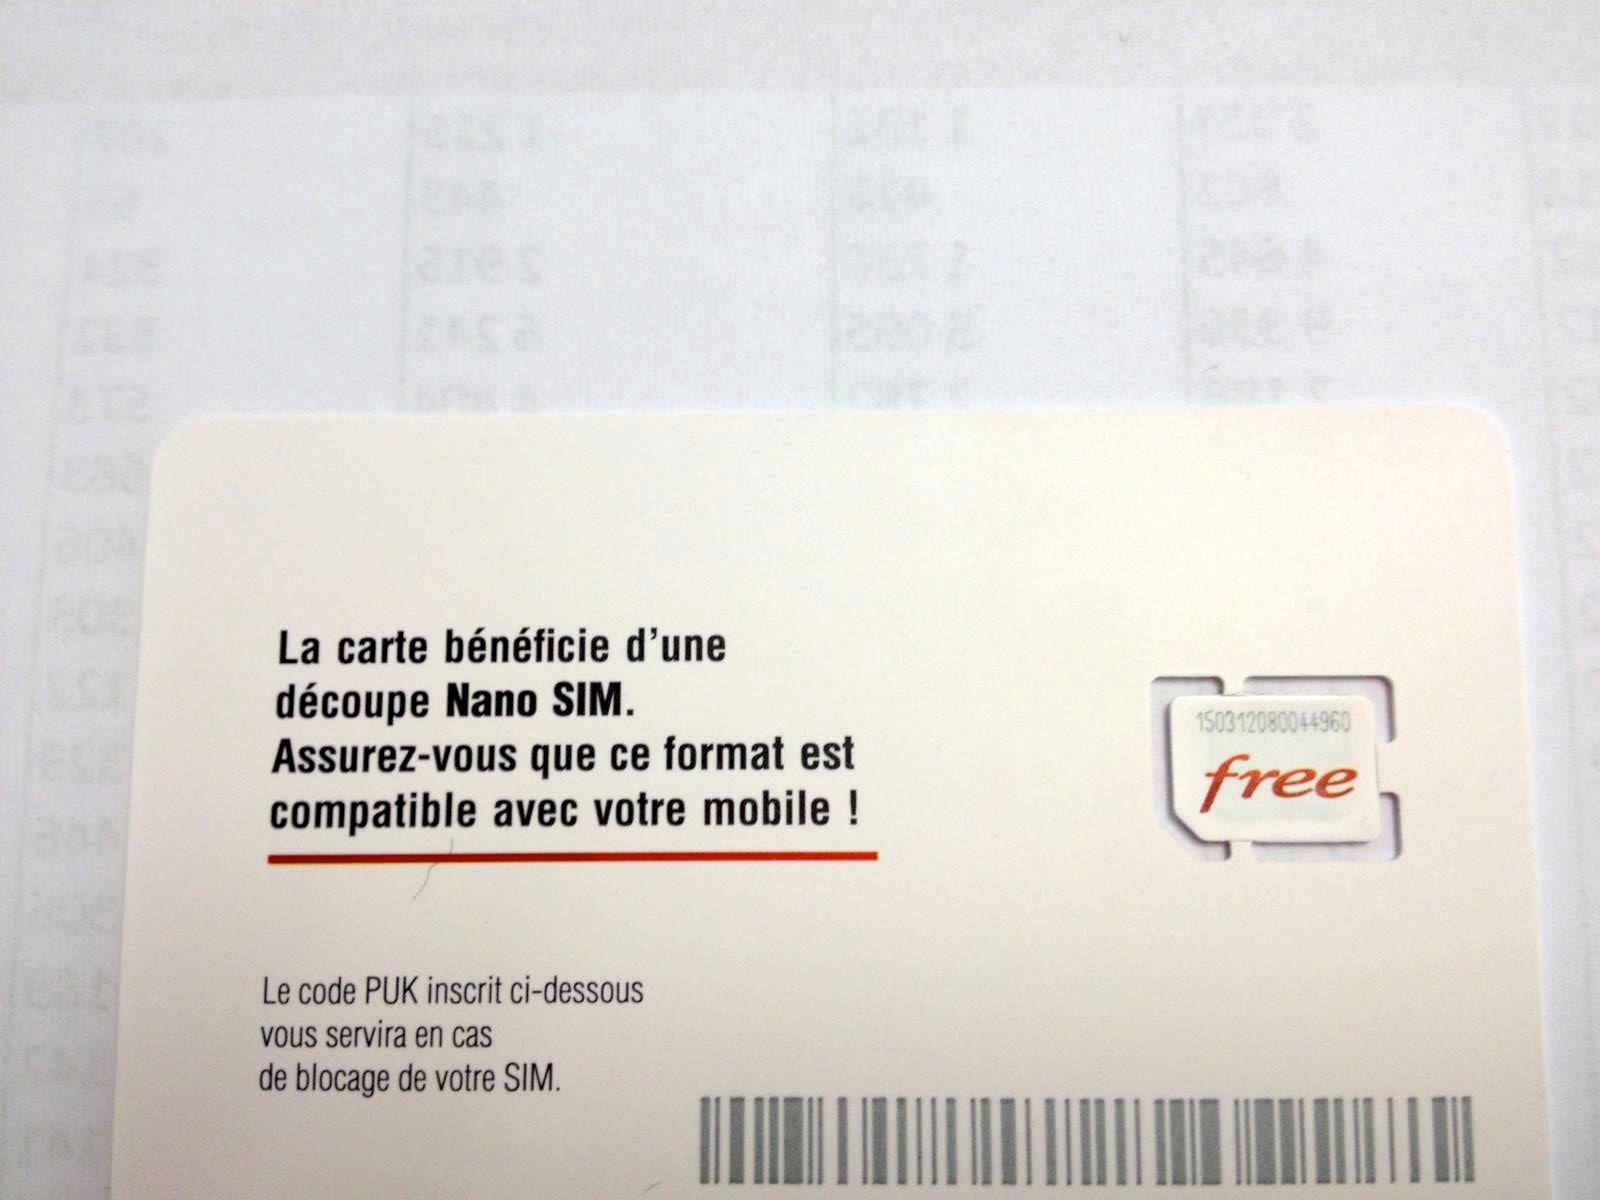 carte sim free nano Photos : les cartes Nano SIM sont prêtes chez Free Mobile